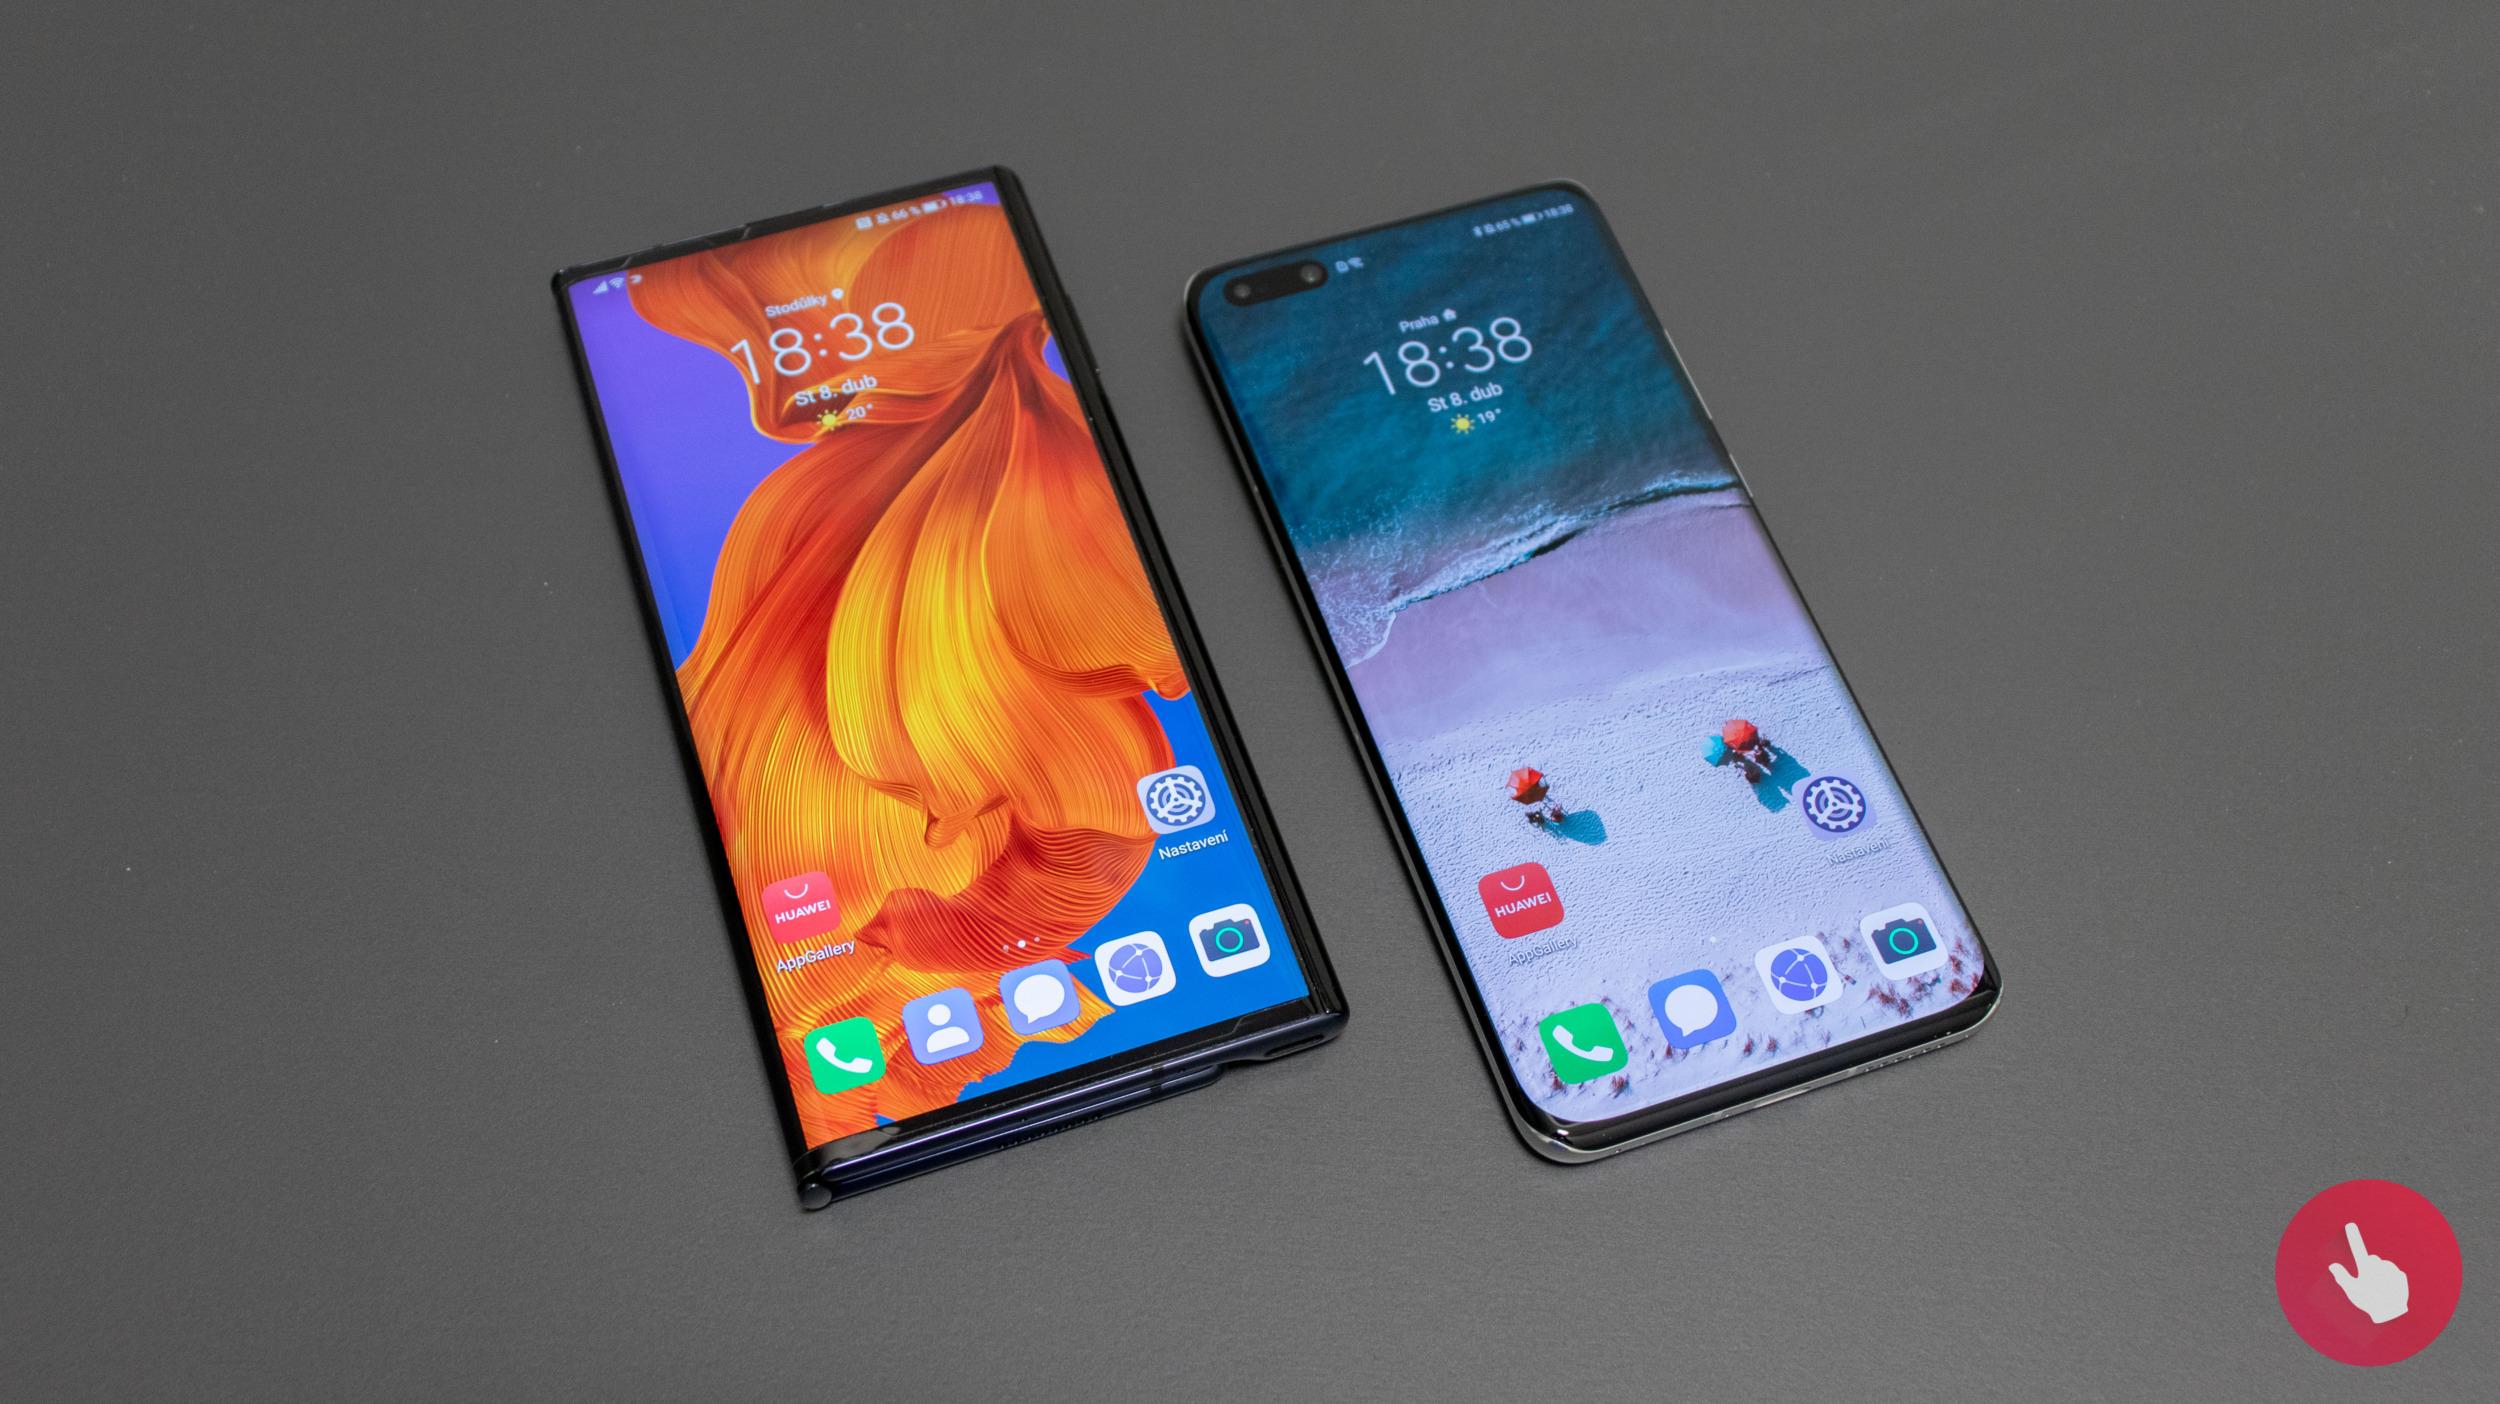 Telefony s EMUI 11 bude možné aktualizovat na nový Harmony OS